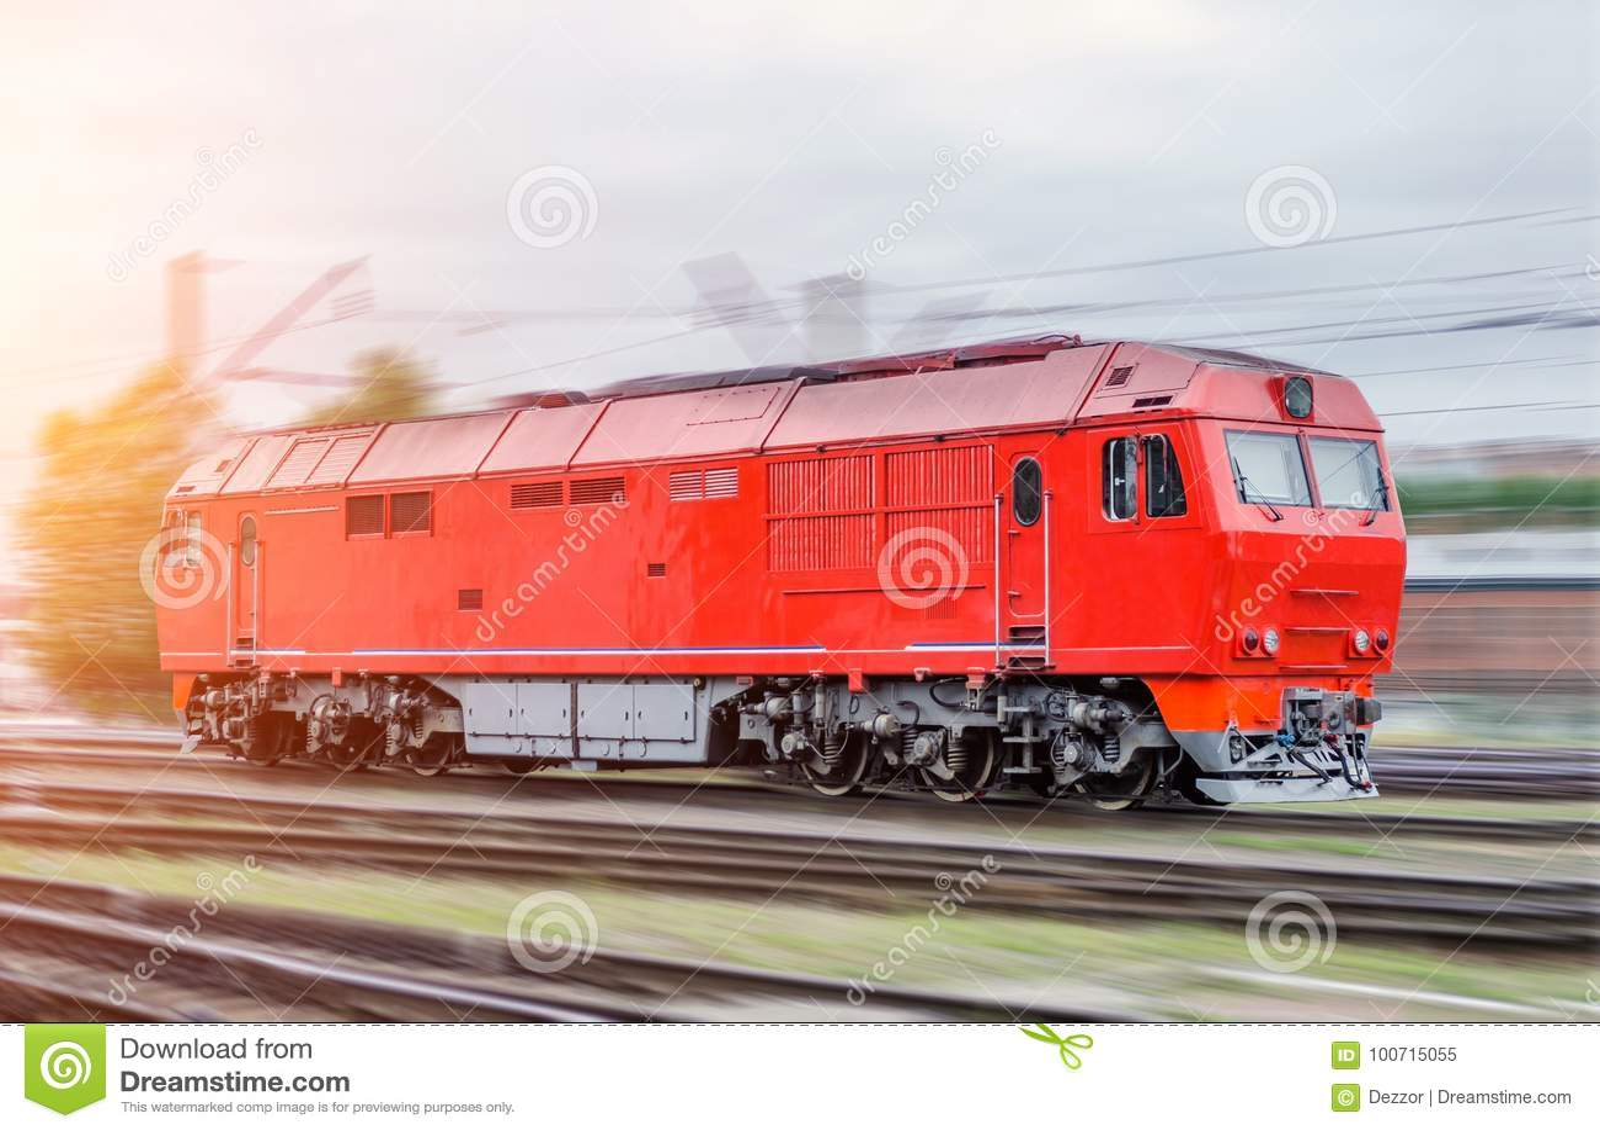 Modern Diesel Locomotive Train Railway In Motion Speed